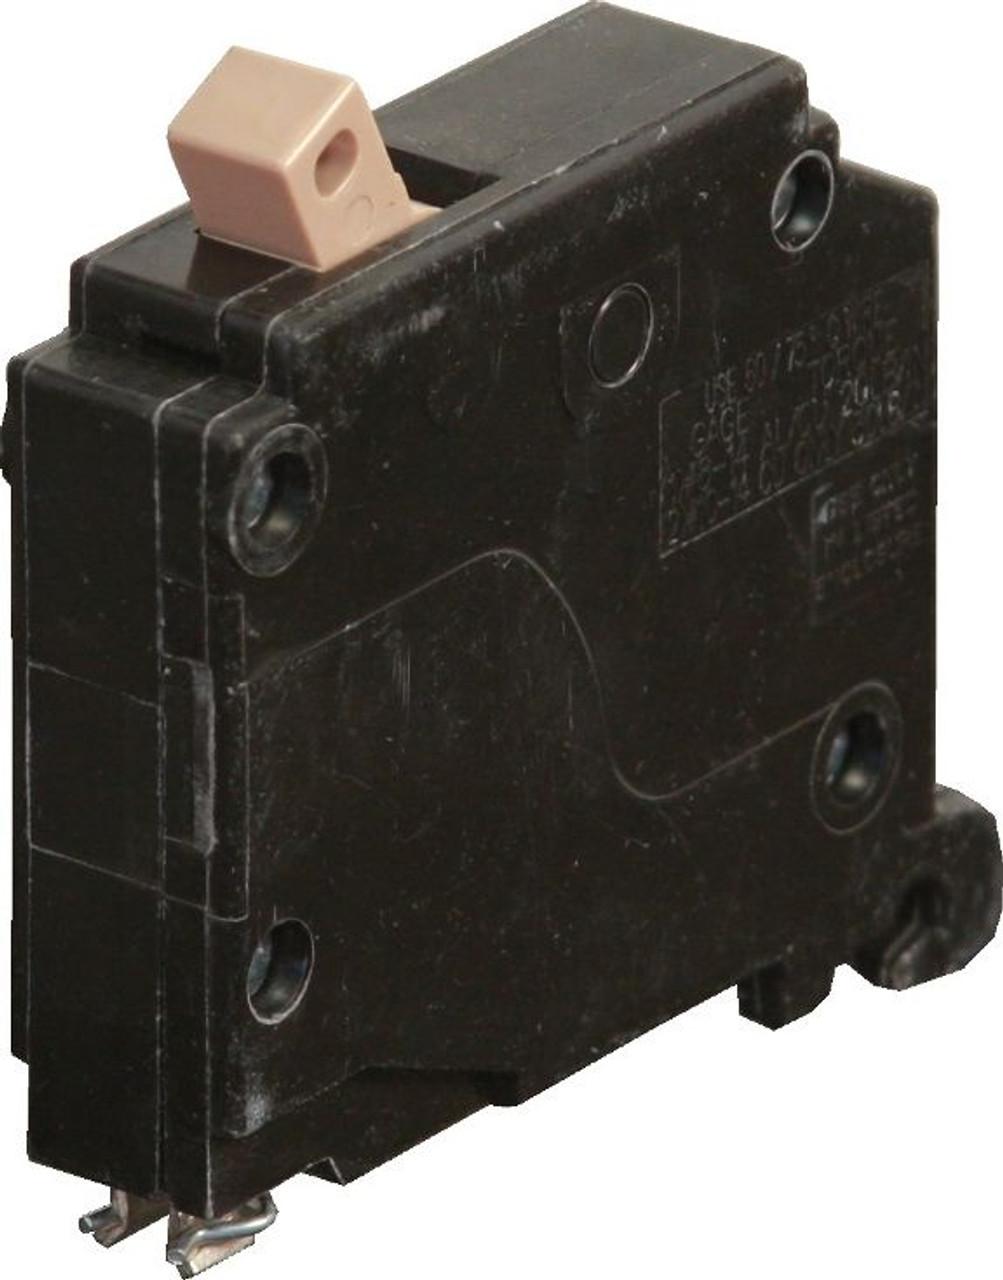 CH115 Obsolete Item